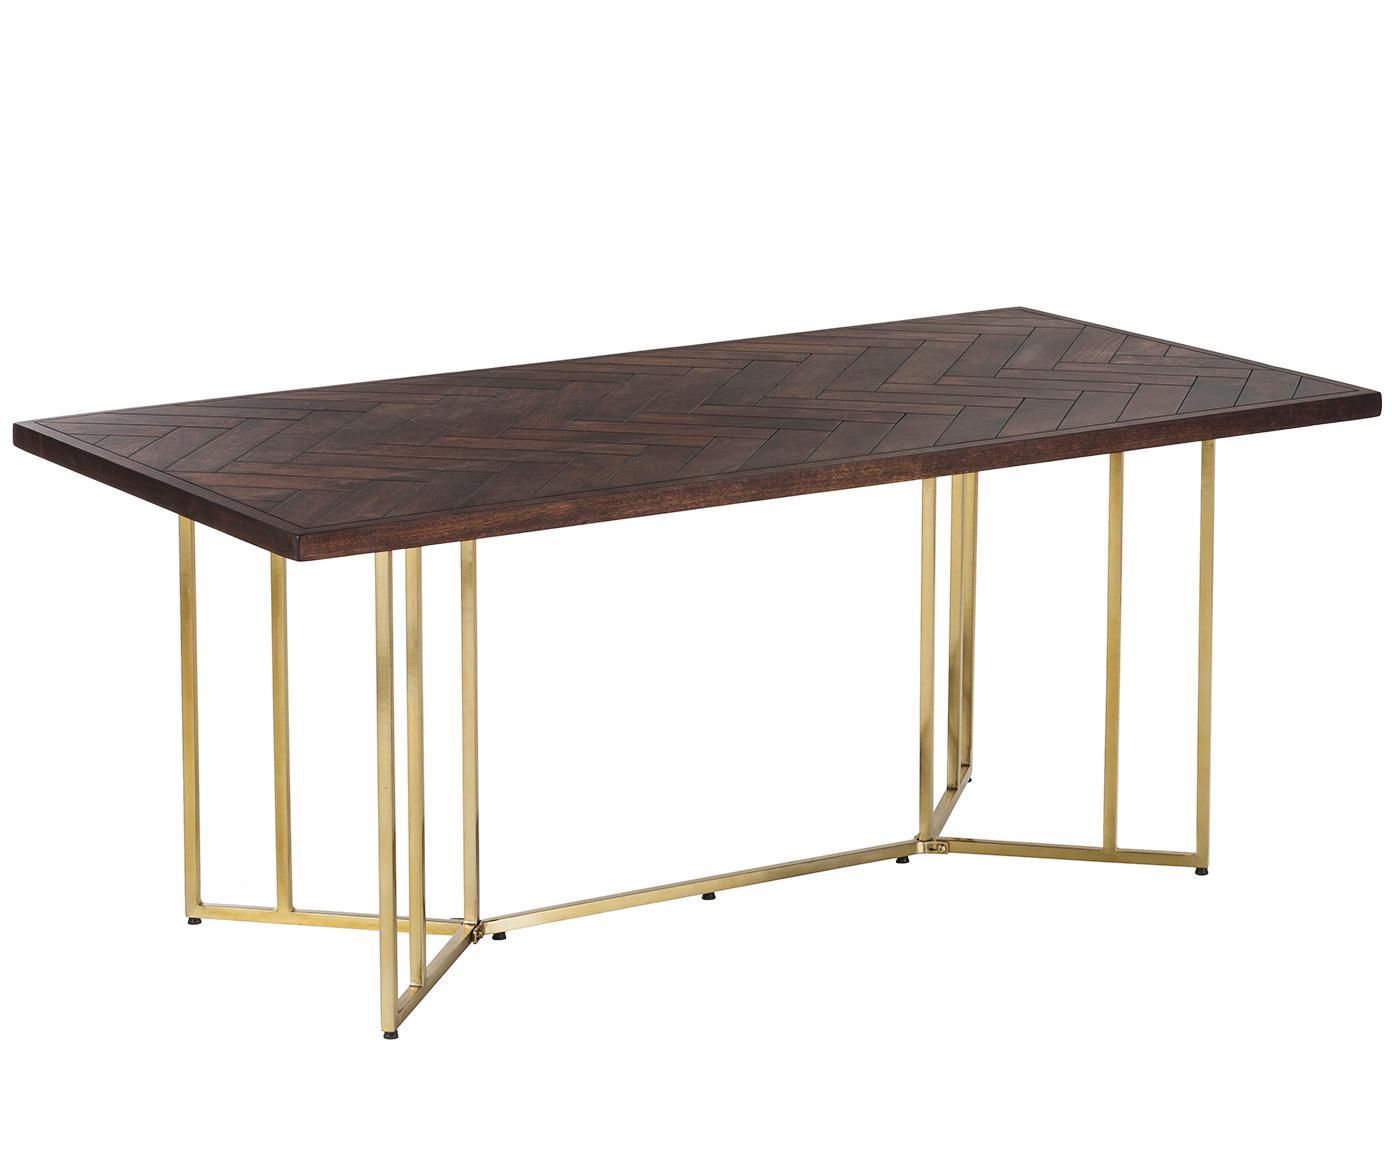 Massief houten eettafel Luca, Tafelblad: mangohout, Frame: gecoat metaal, Tafelblad: donker gelakt mangohout. Frame: goudkleurig, B 180 x D 90 cm